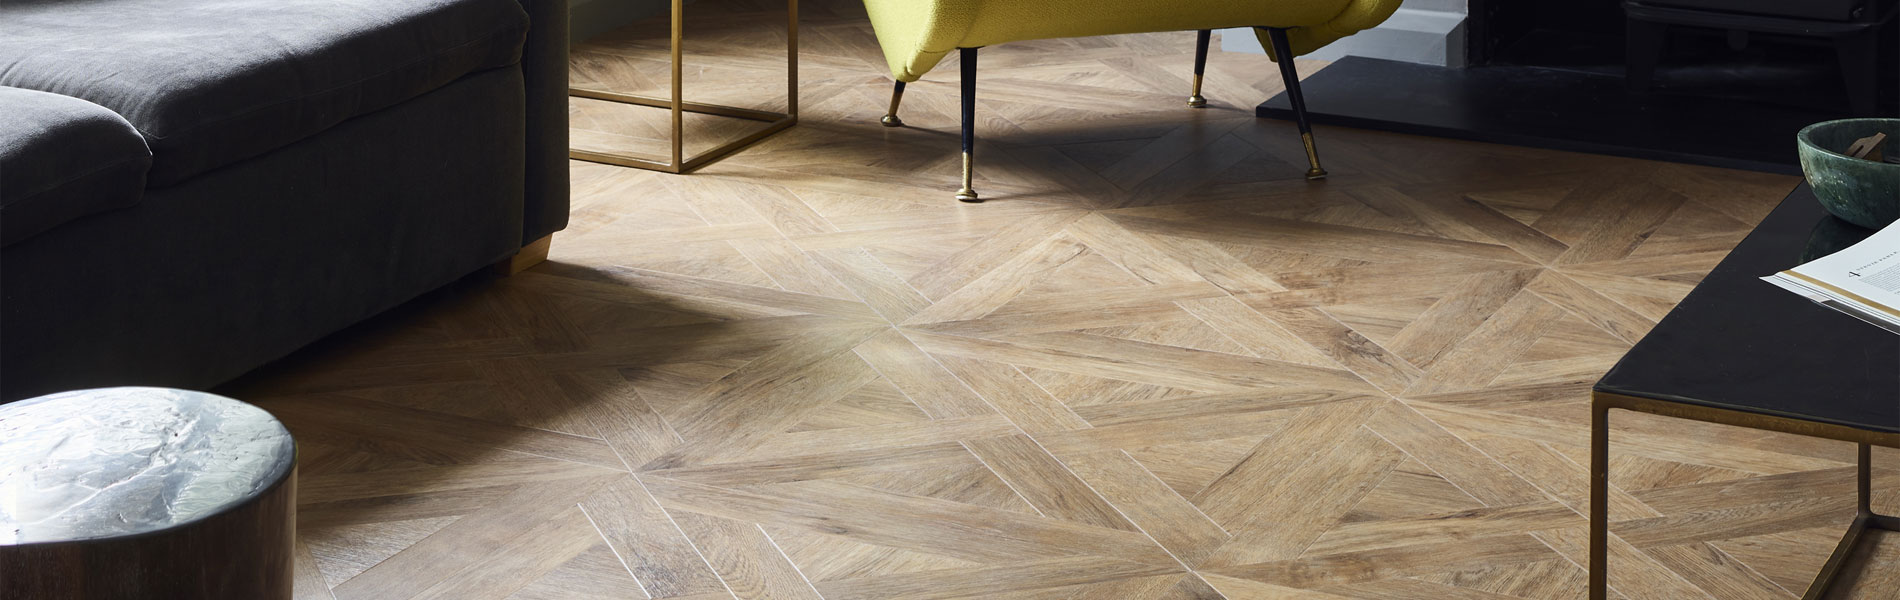 Whittons Flooring